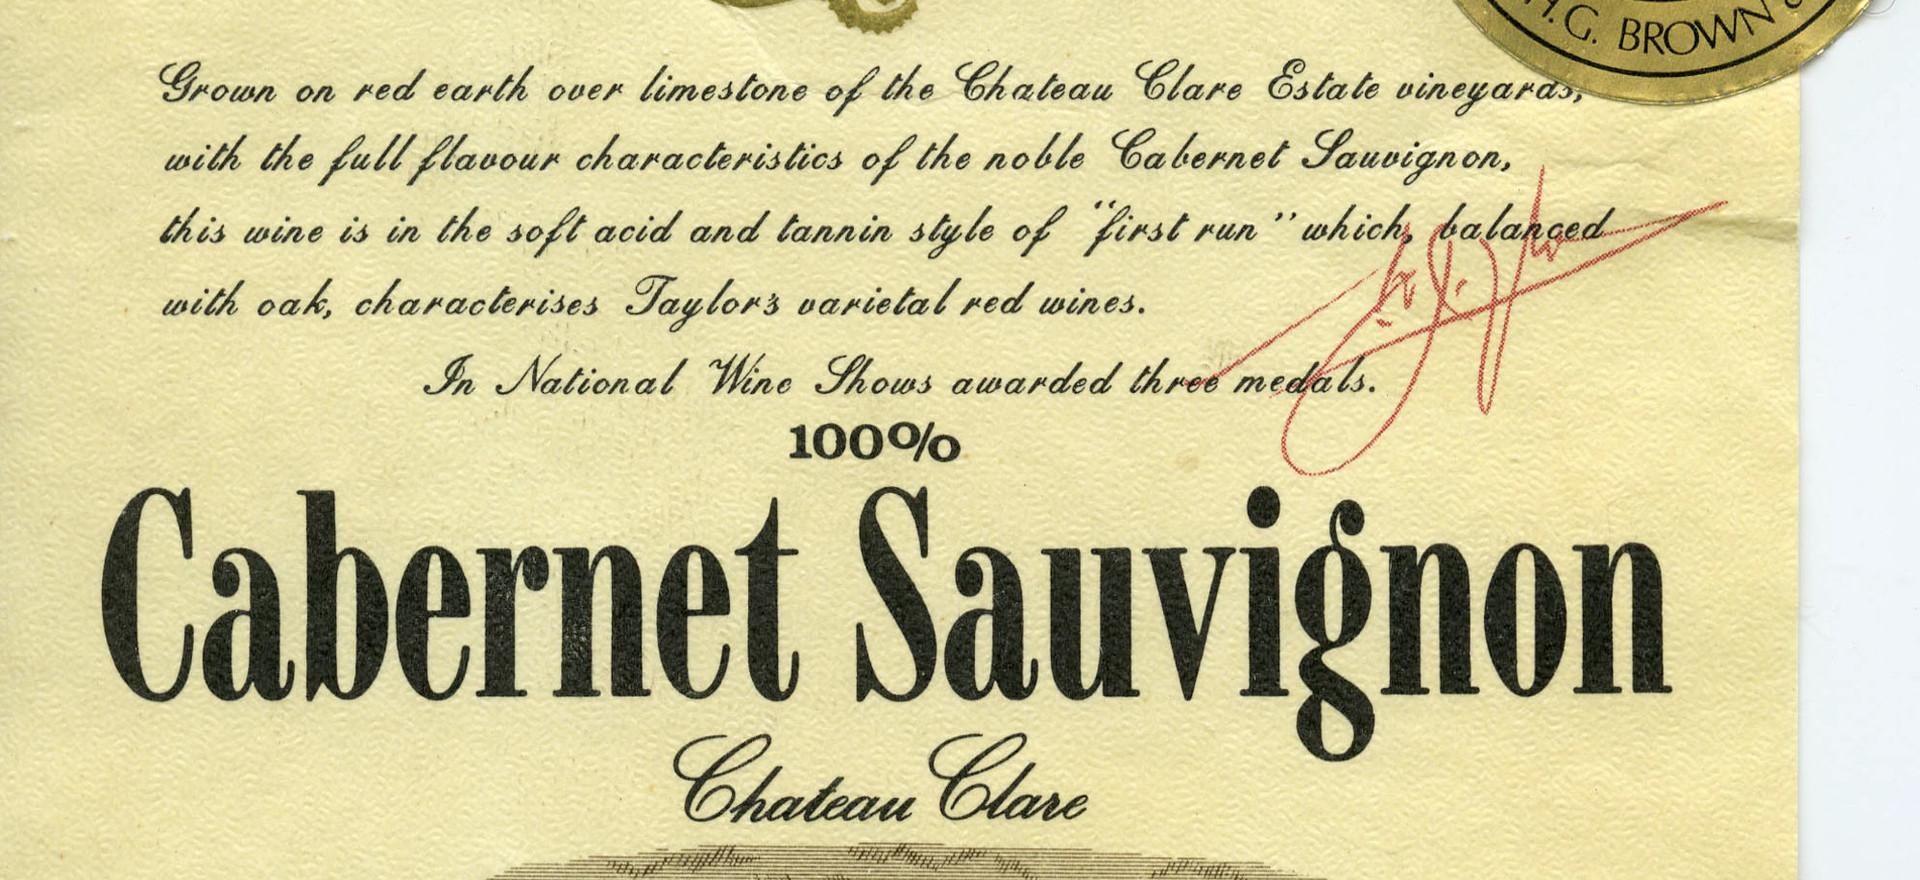 Taylors Cab Sav. 1974 label